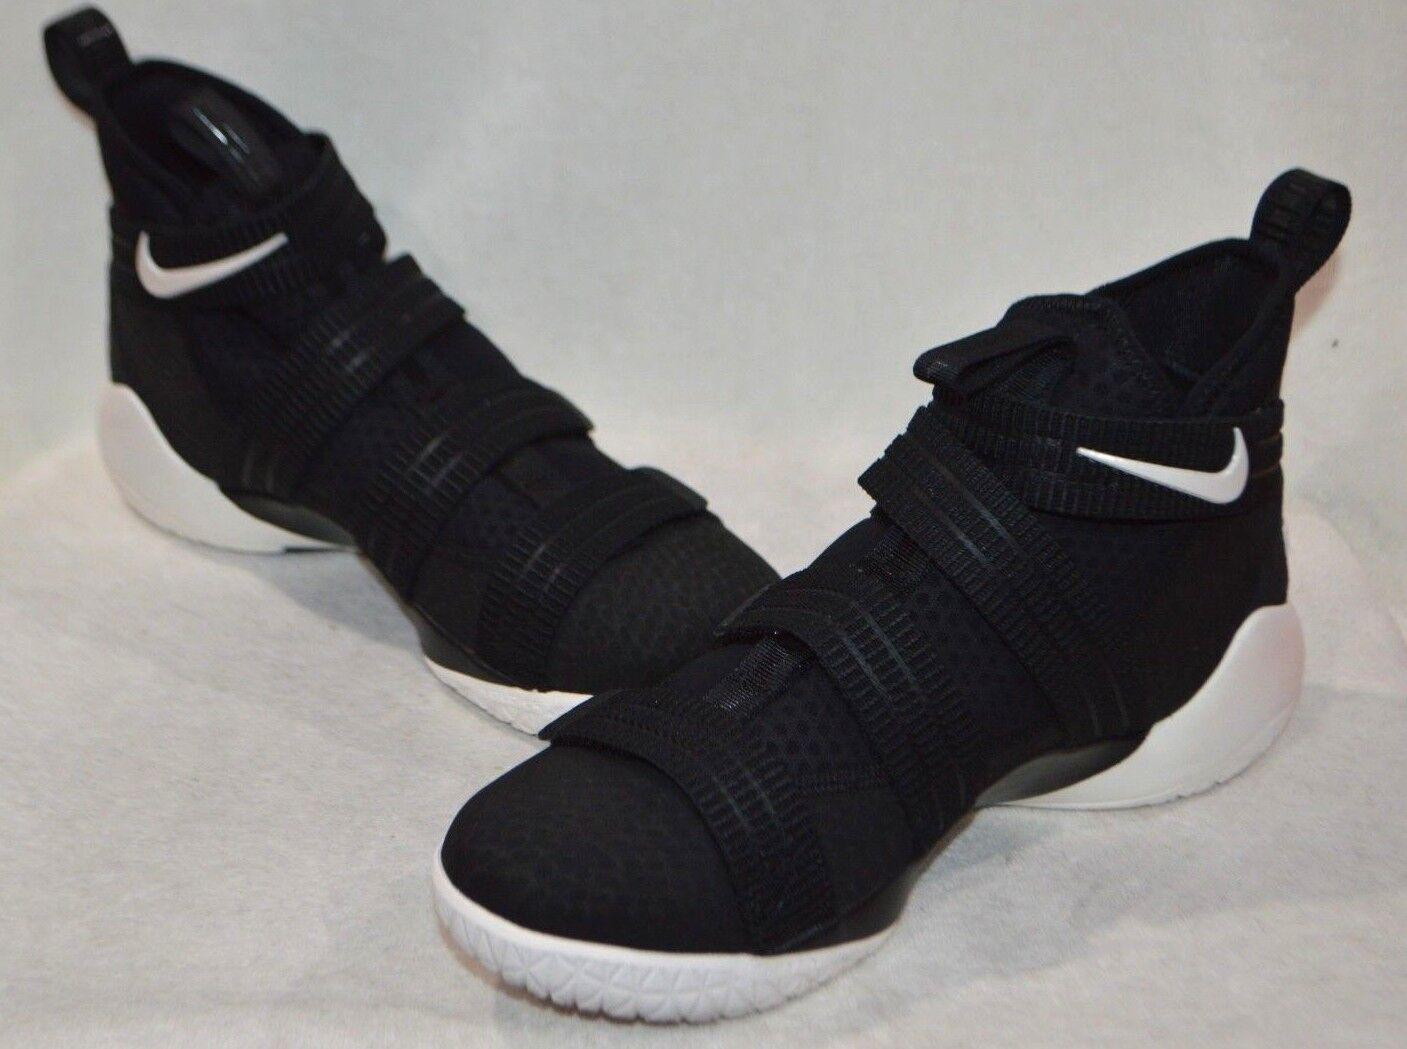 Nike LeBron Soldier XI SFG SFG SFG Nero Sail R-BLU SCARPE DA BASKET UOMO-SZ 10.5 NUOVO SENZA SCATOLA 3079aa